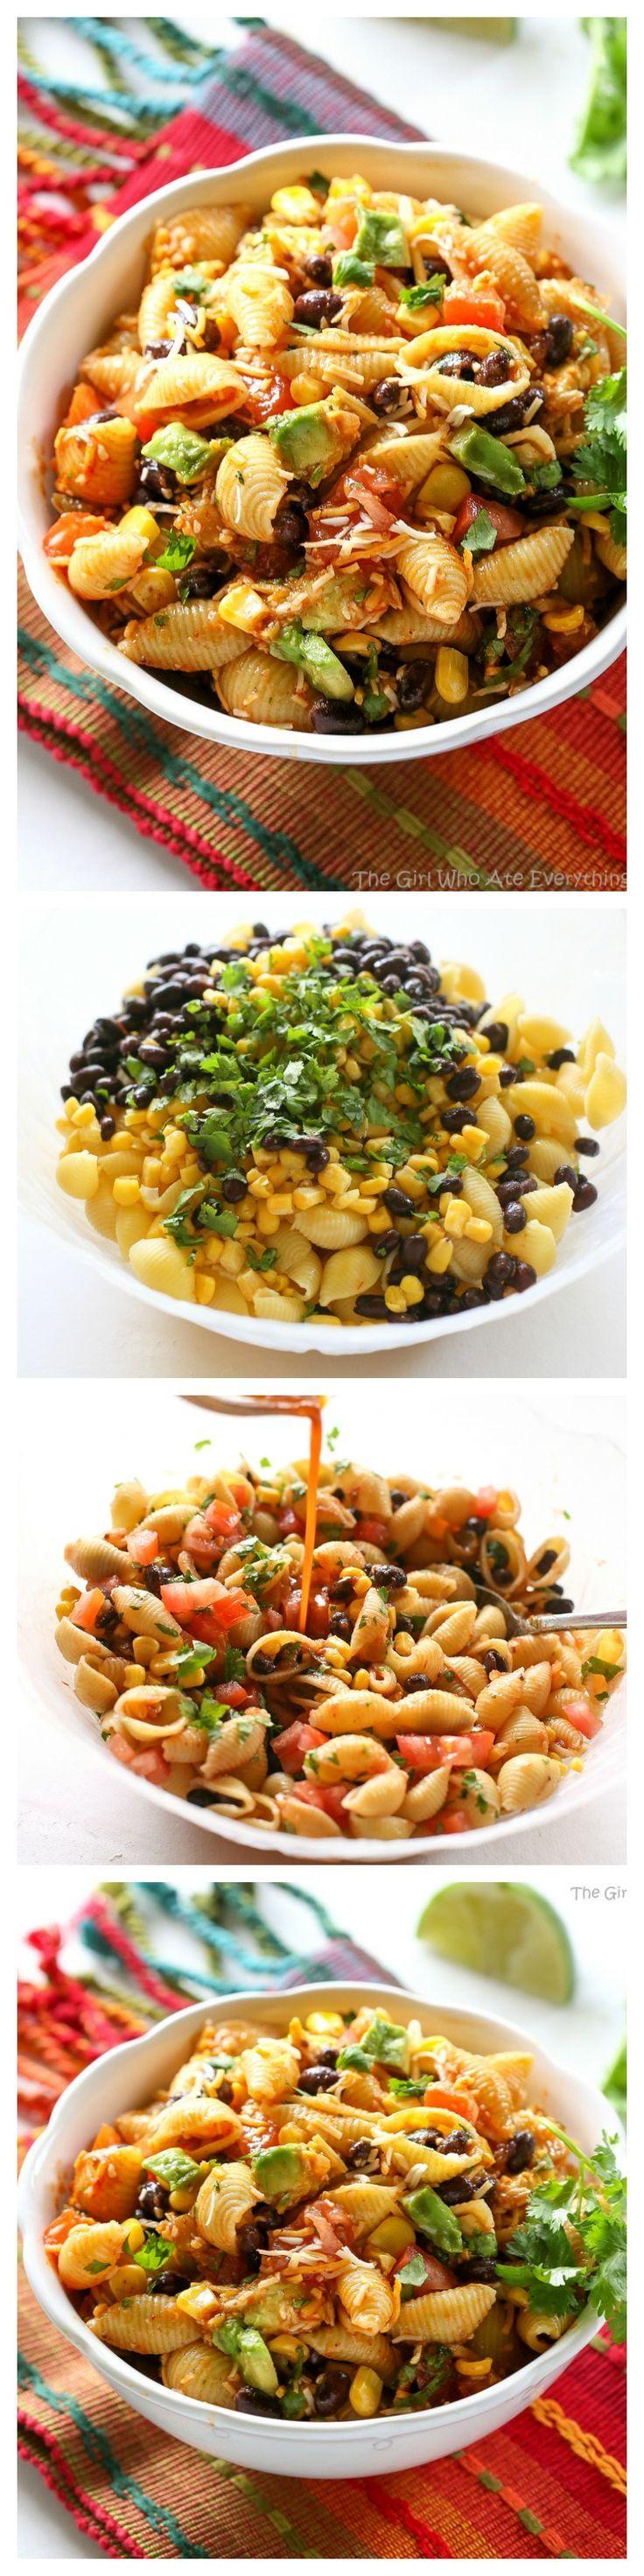 Oman Küche Rezepte   29 Besten Koawach Recipes Rezepte Bilder Auf Pinterest Rezepte